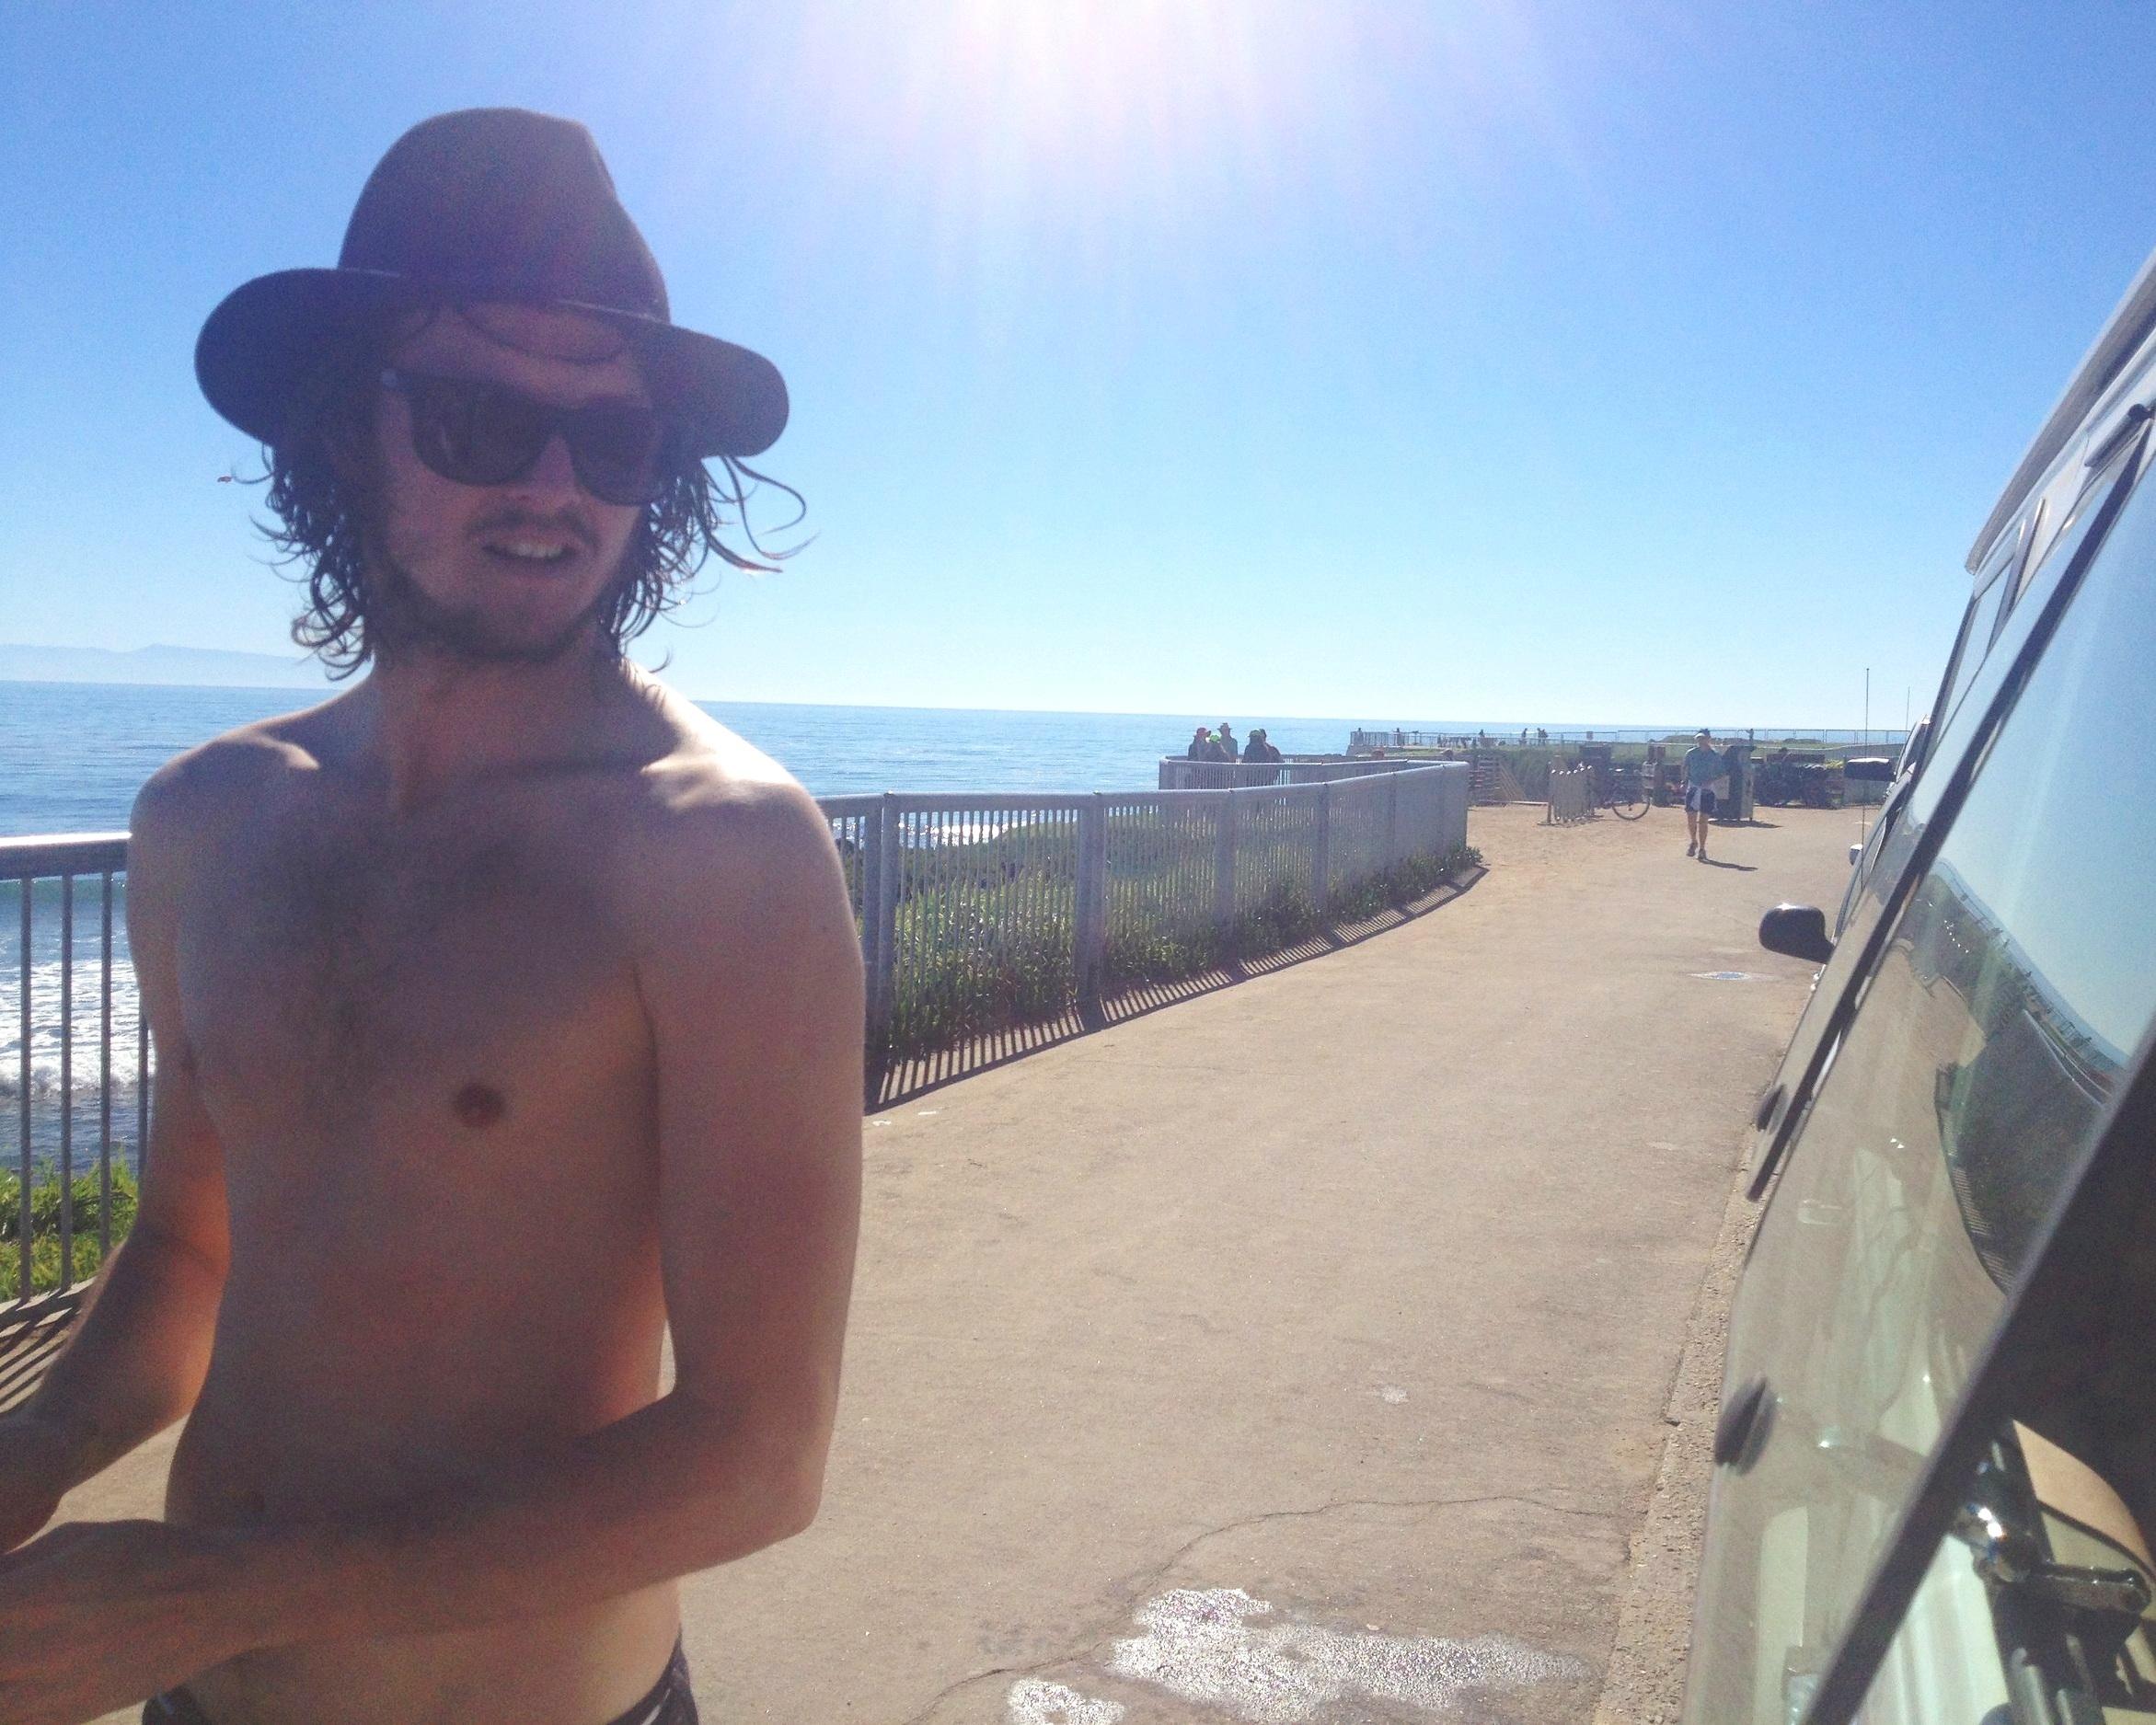 Surfing+in+Santa+Cruz